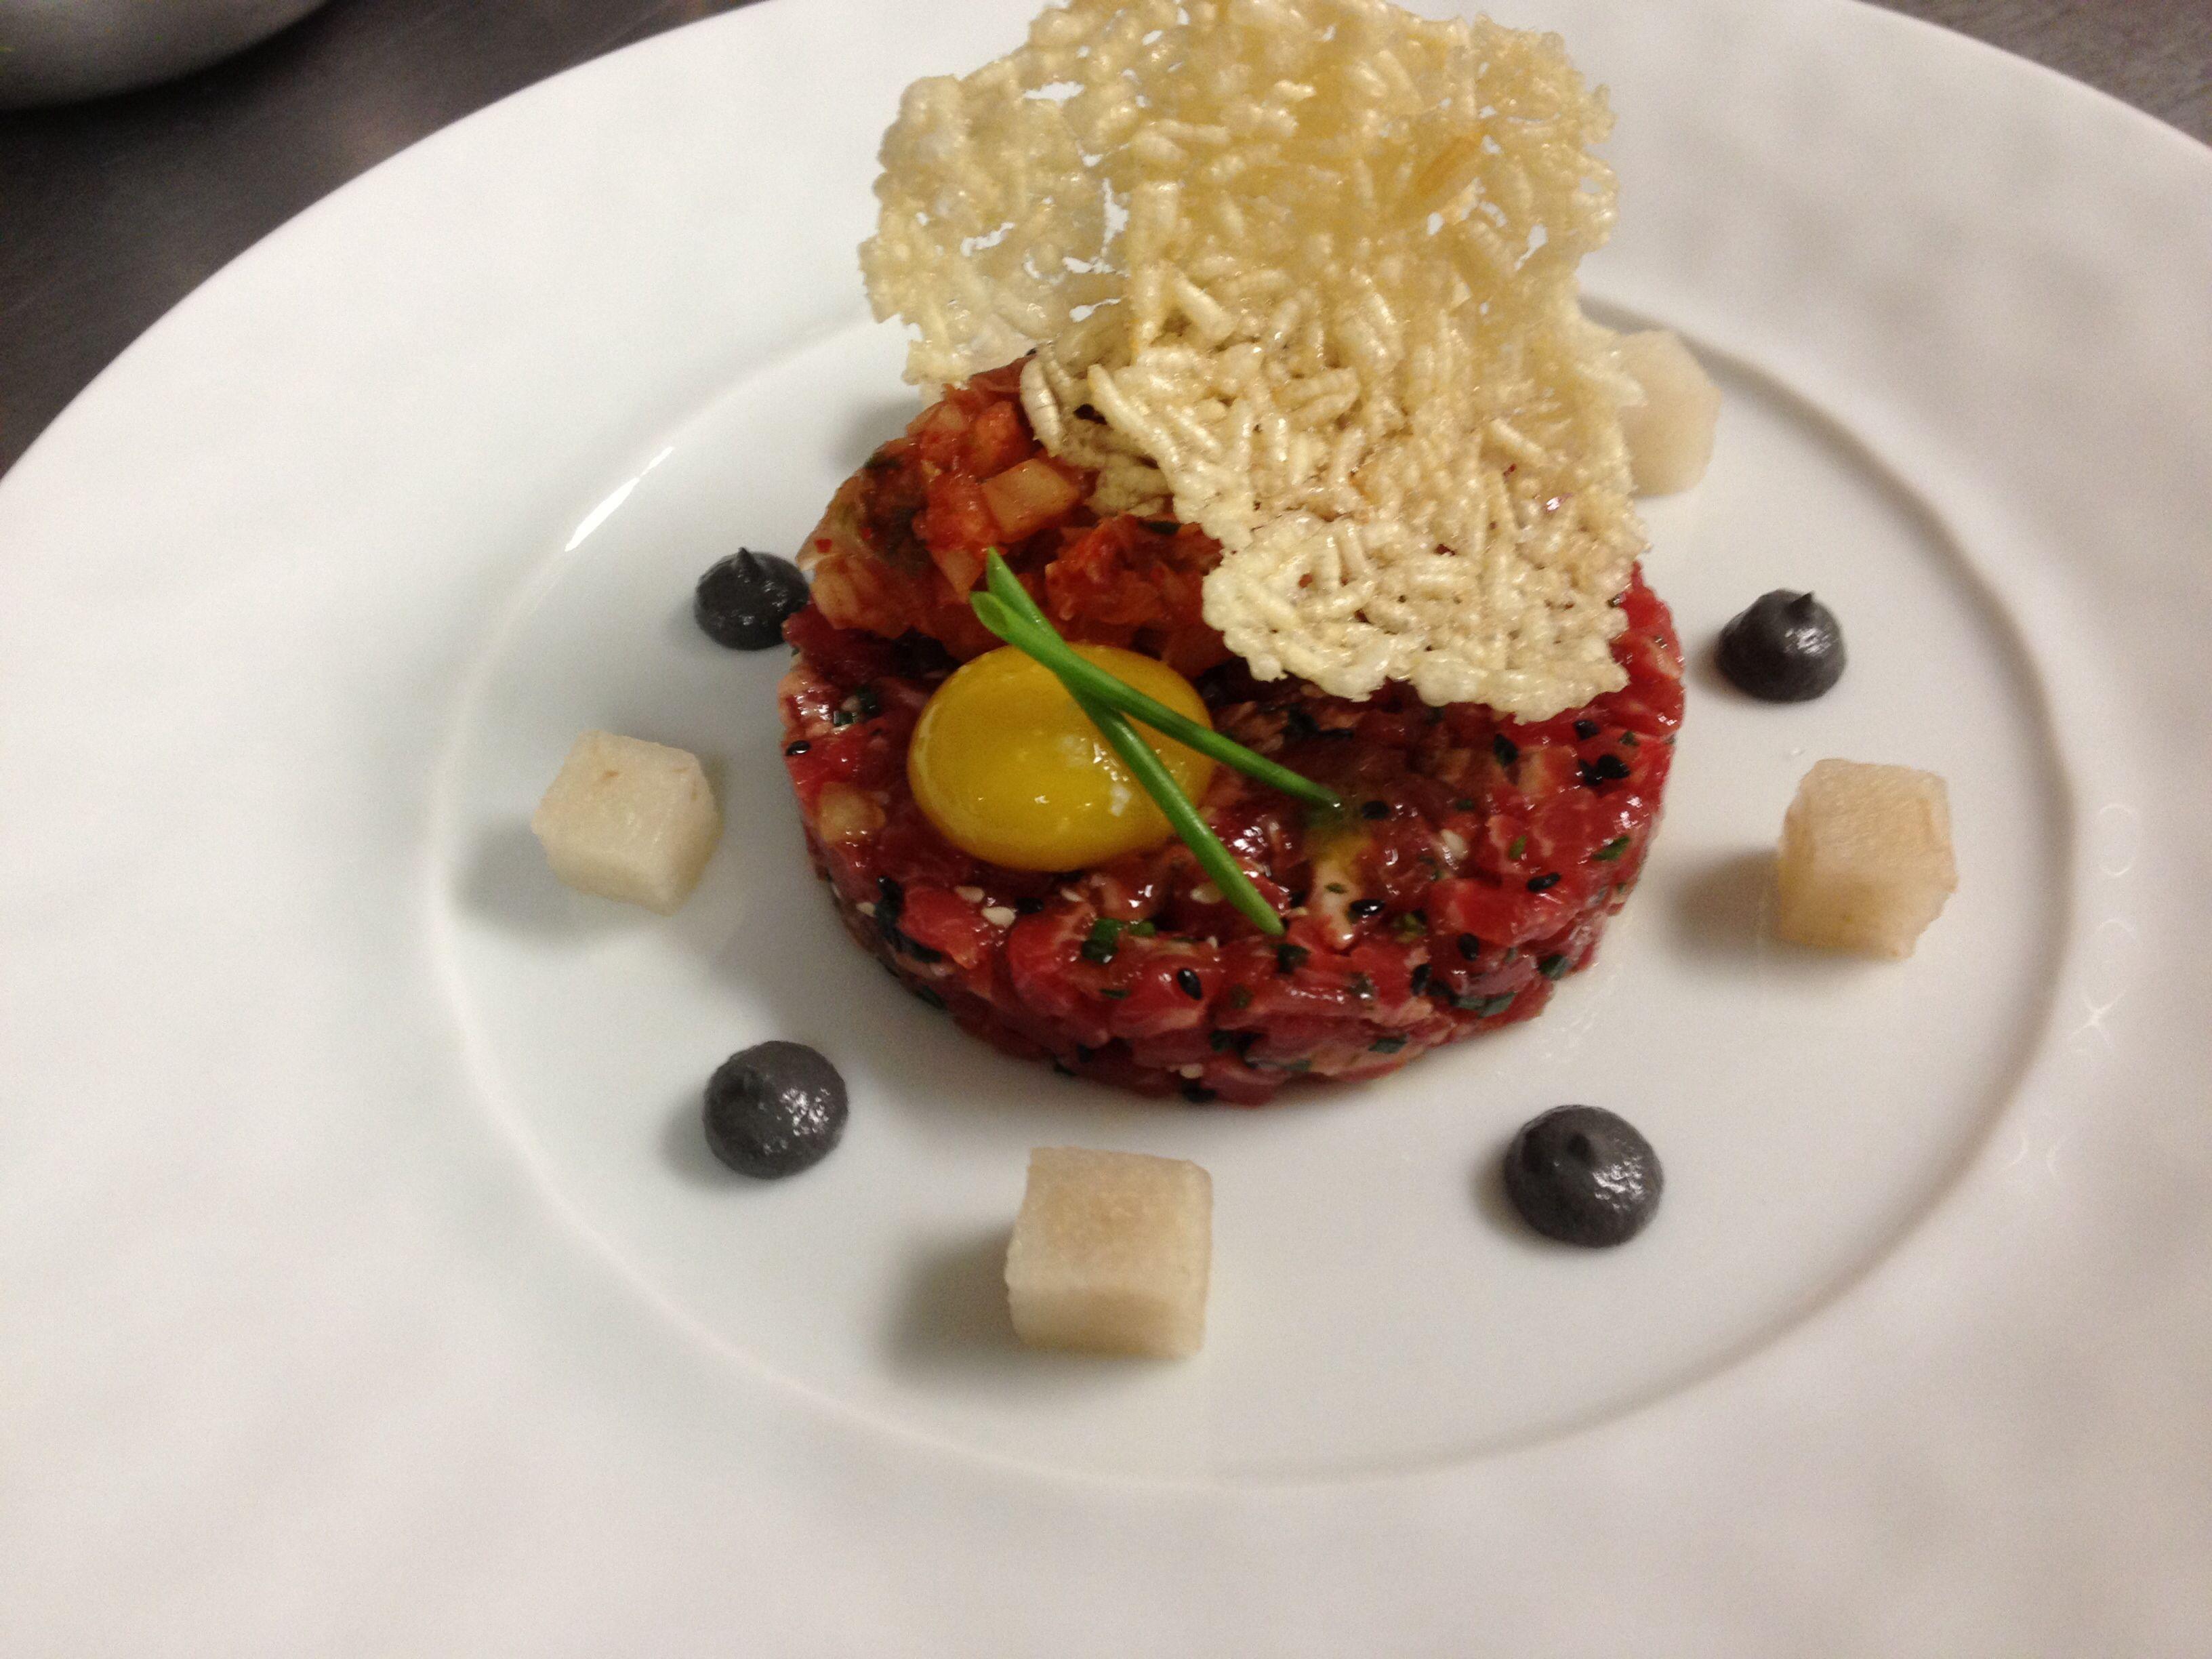 Korean beef tartare | Culture watch: Korea | Pinterest